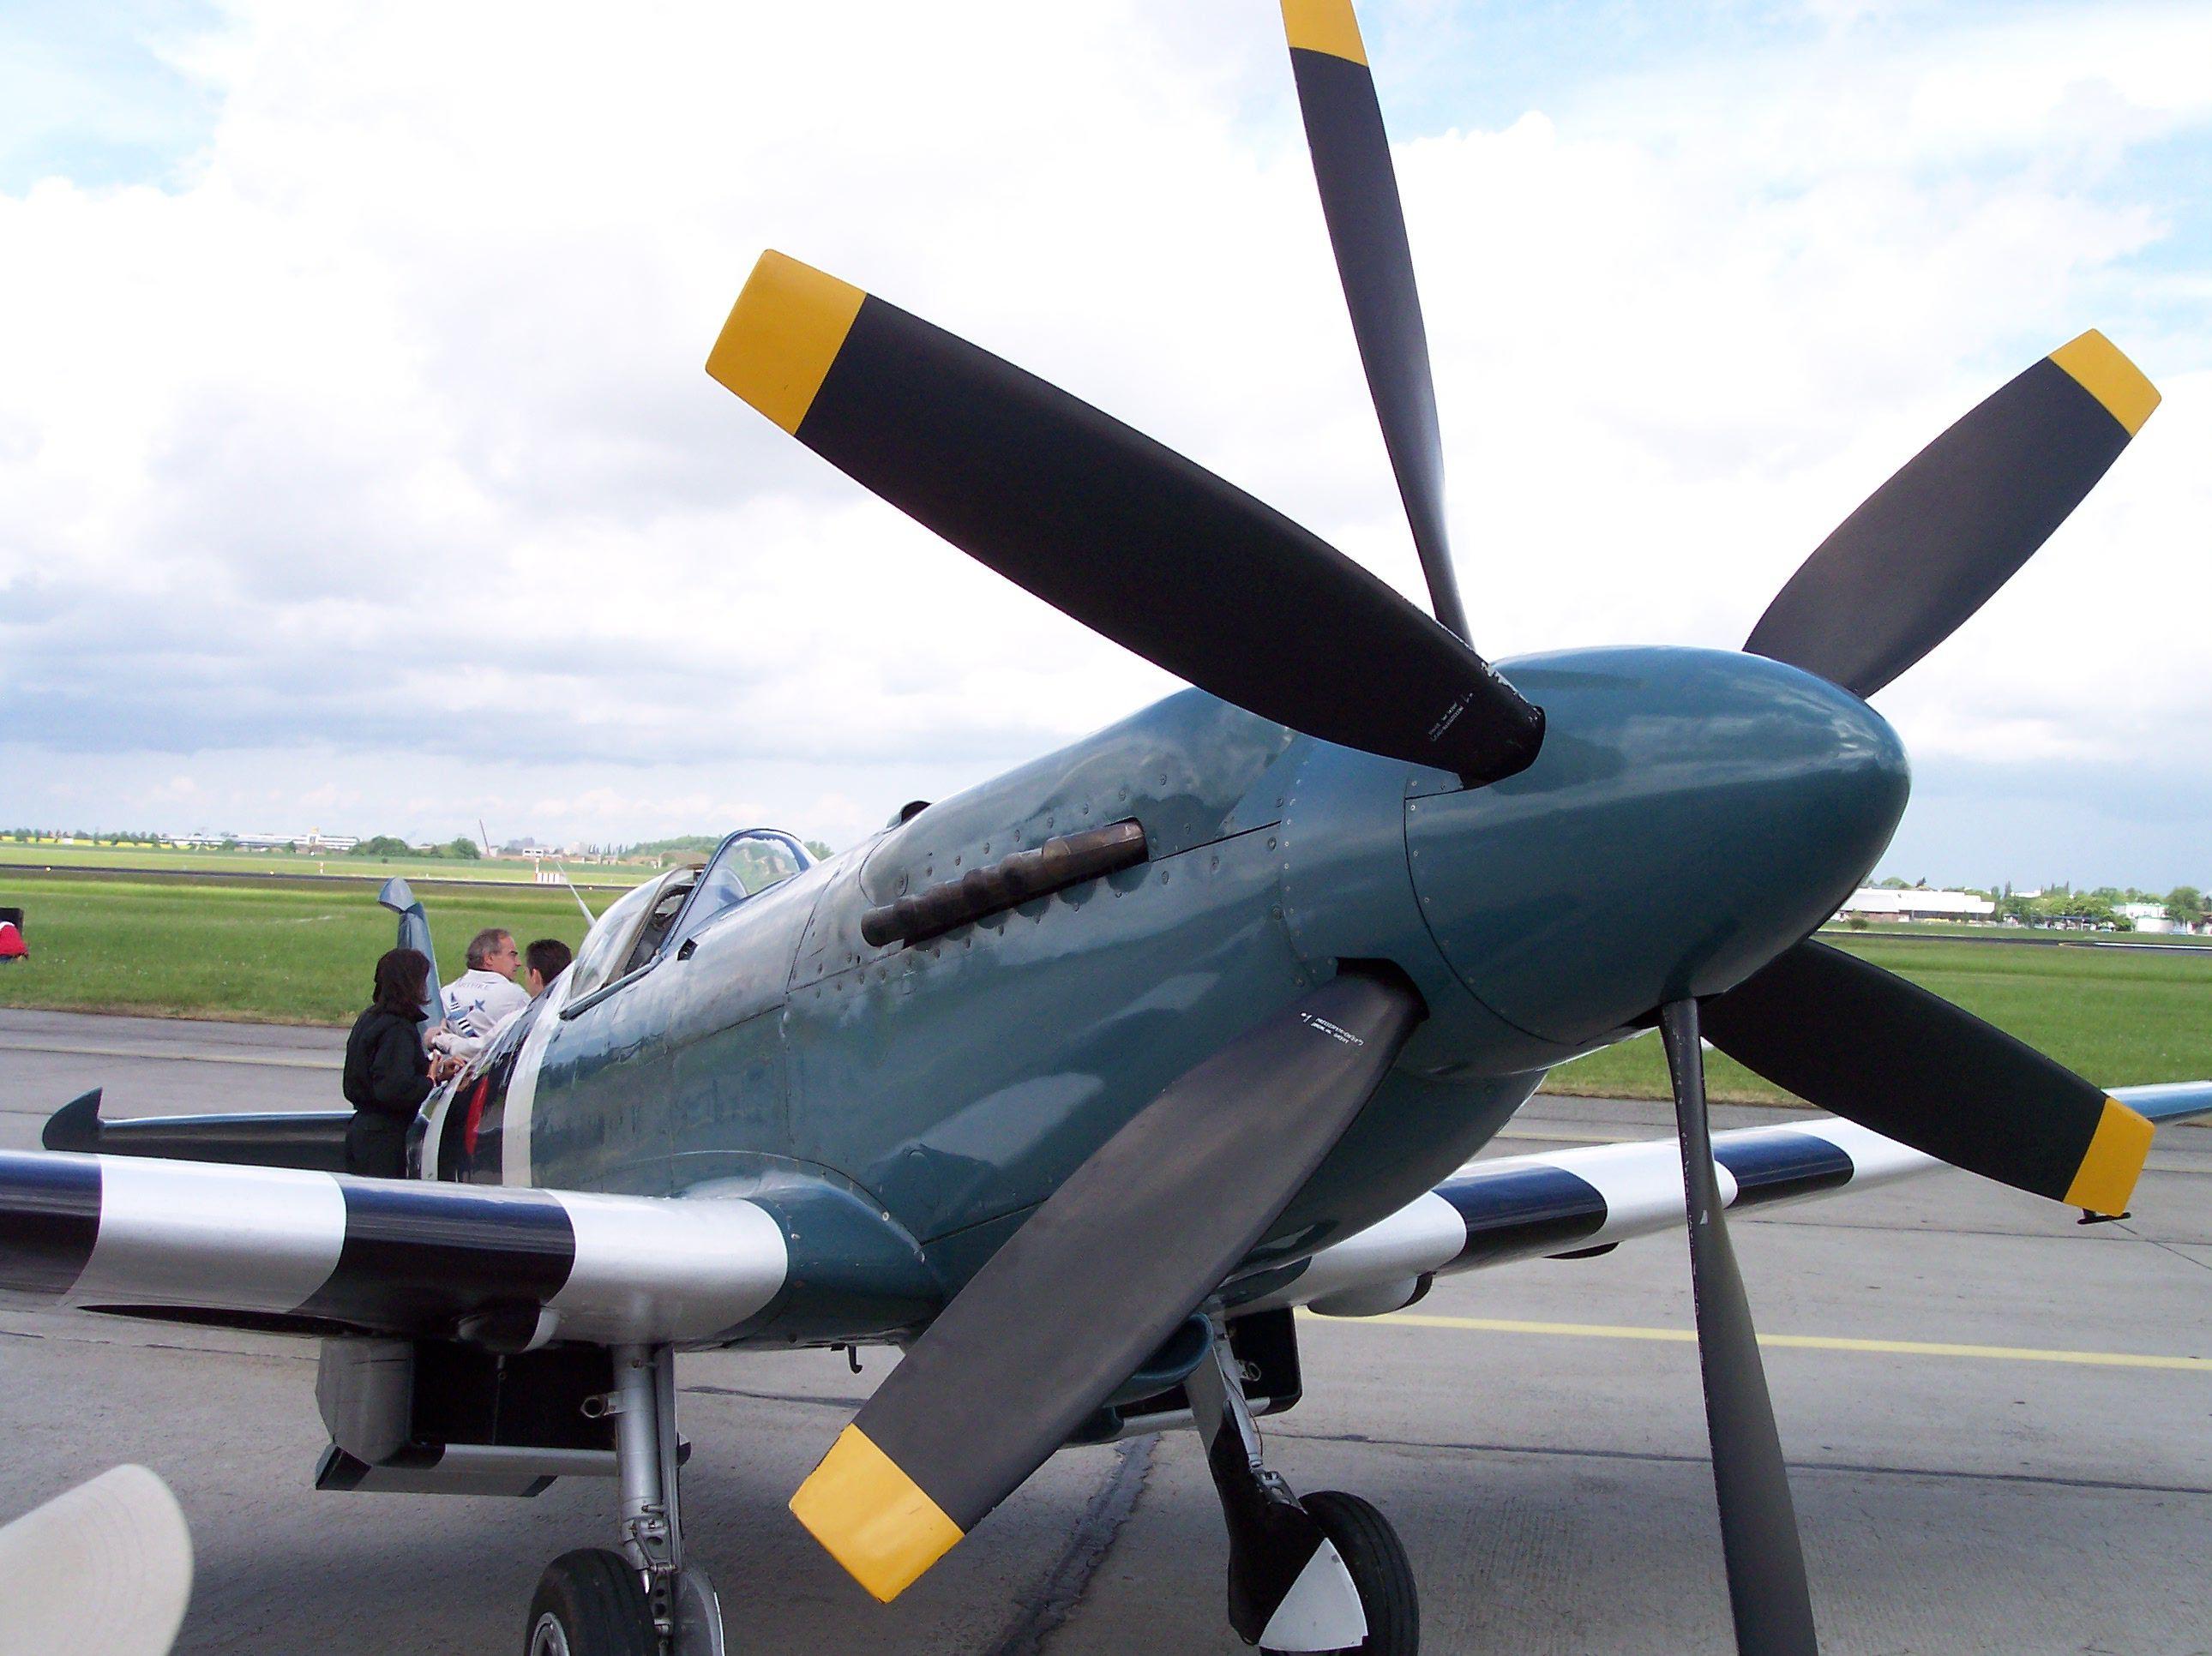 Spitfire Crash 11 Jun 17 on t/o